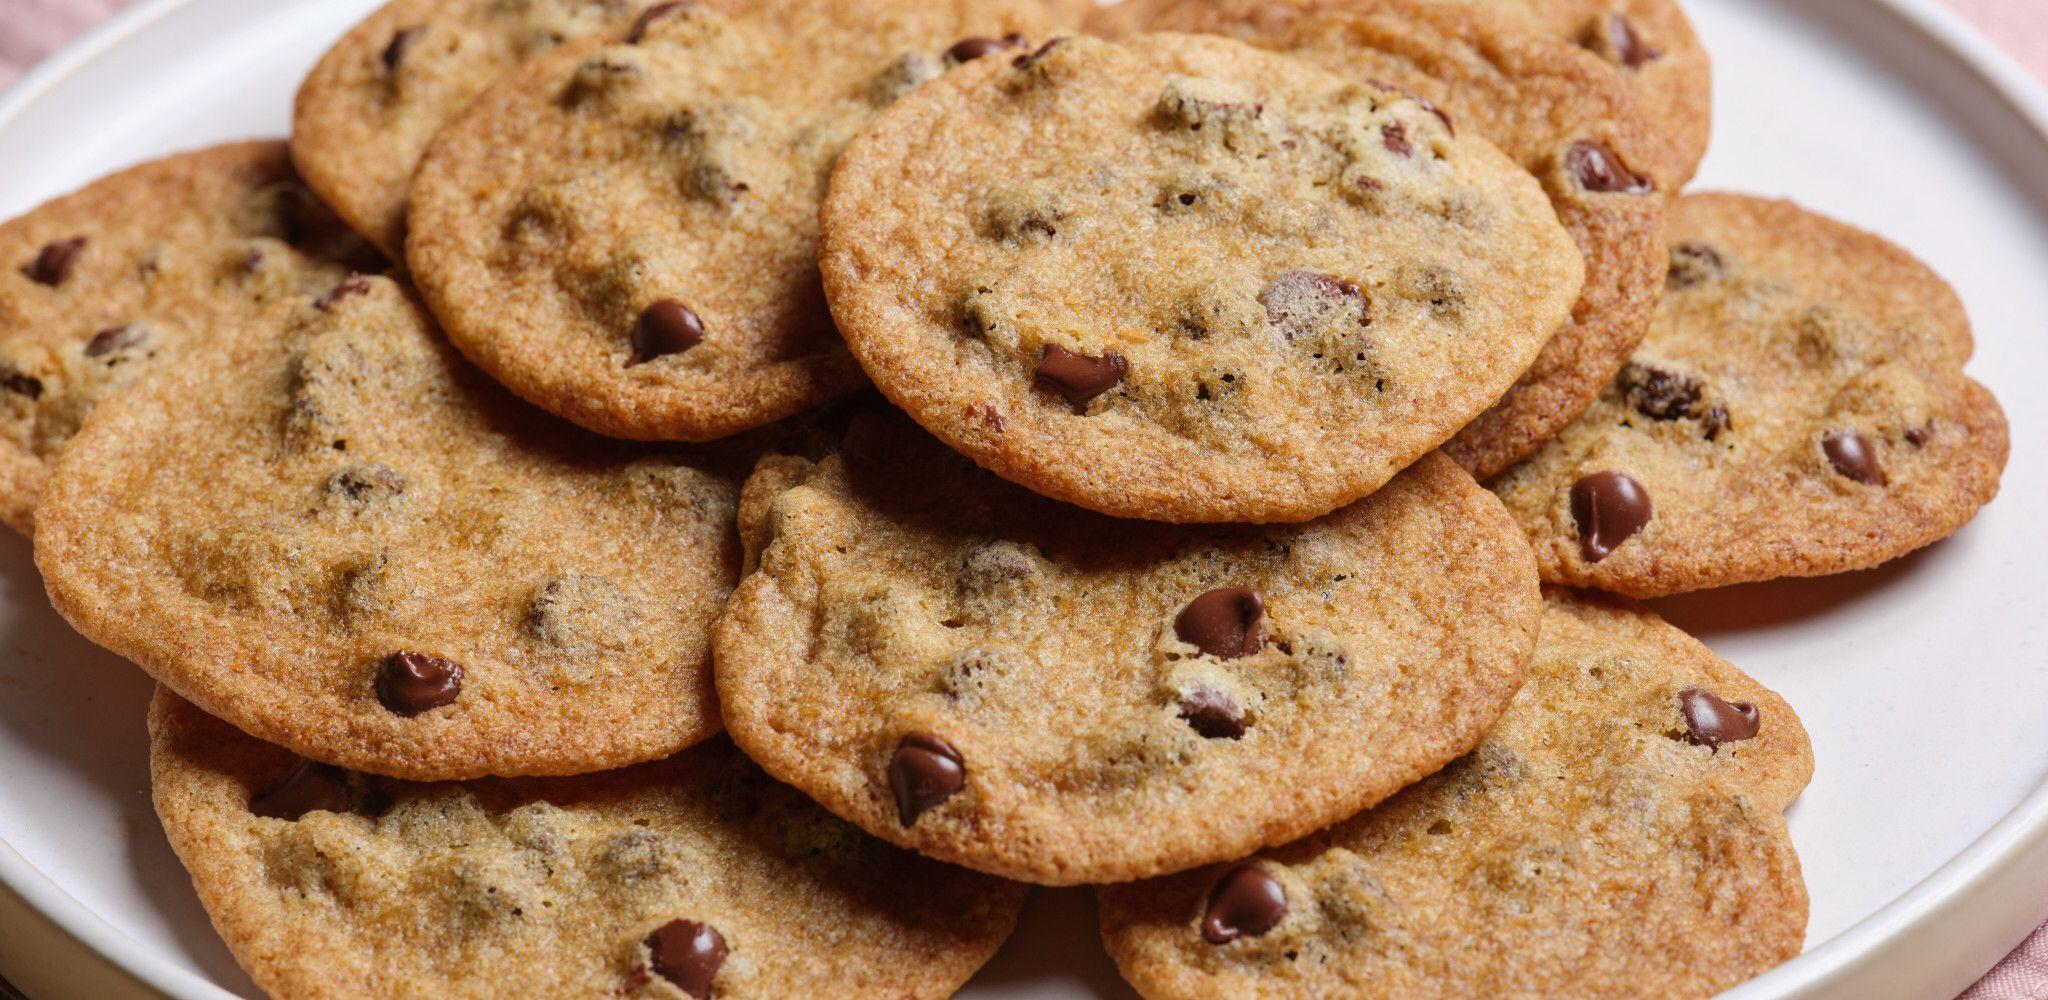 The Best Crispy Chocolate Chip Cookies | Recipe in 2020 ...